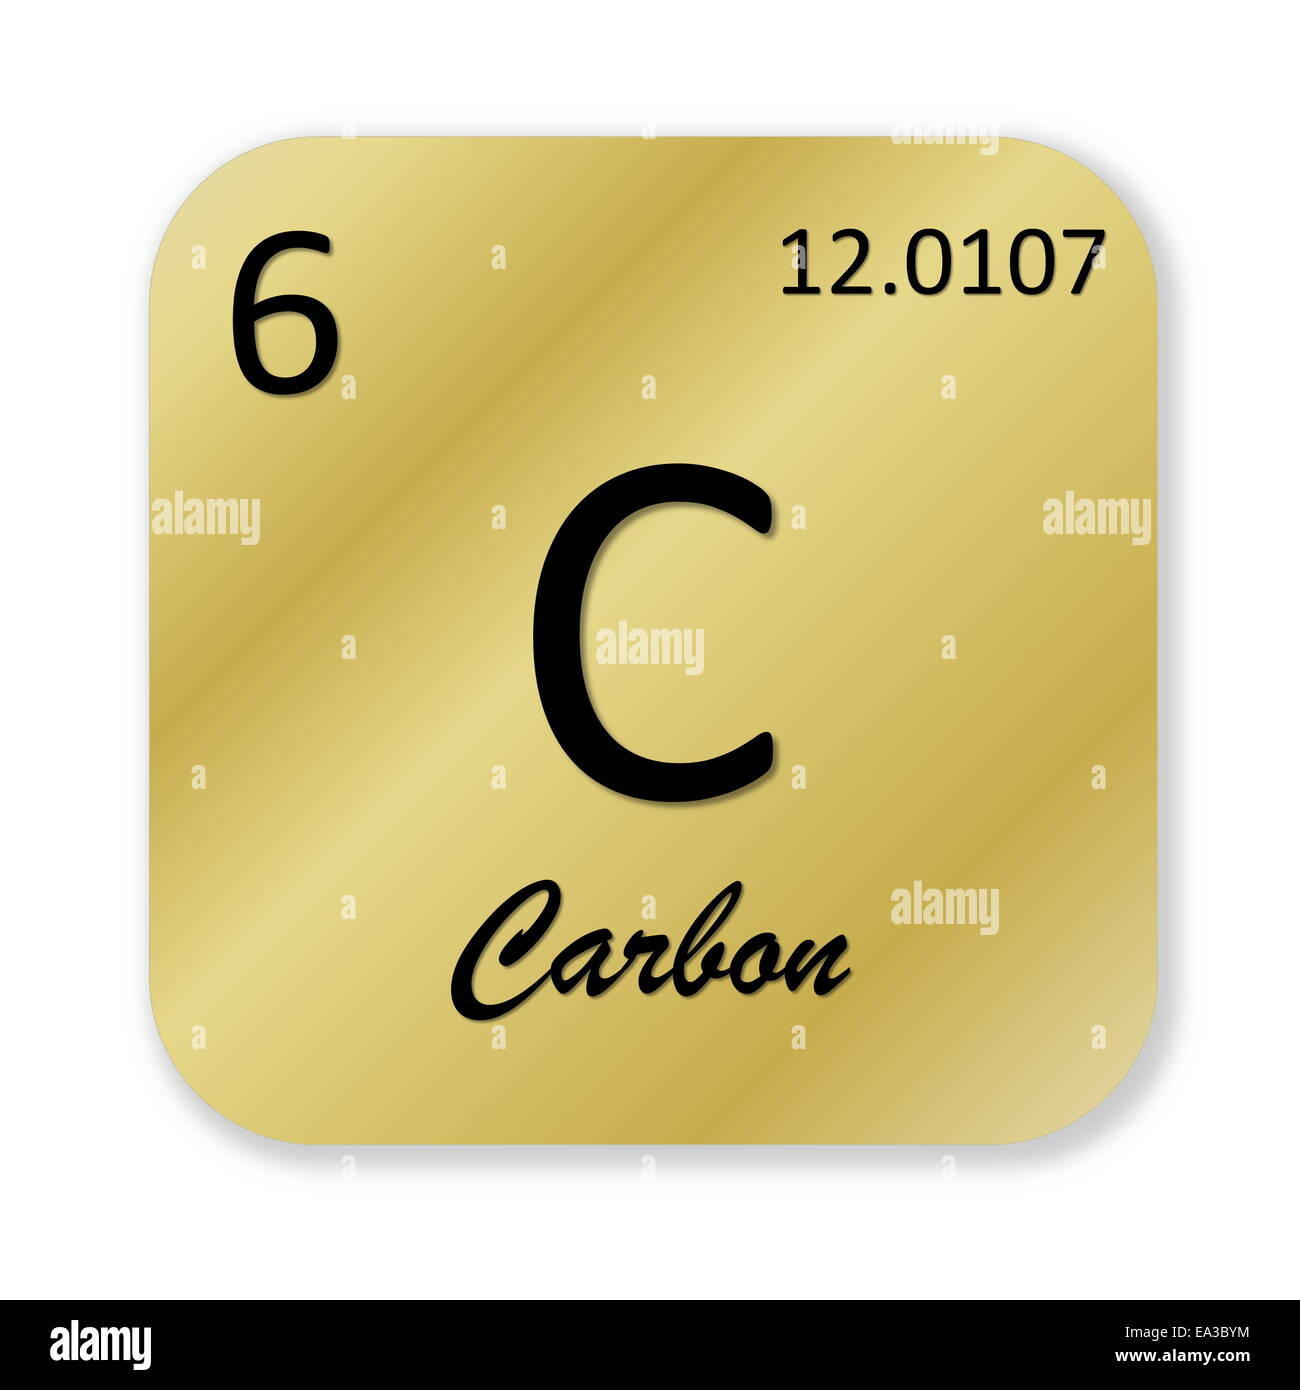 Carbon element stock photo royalty free image 75063288 alamy carbon element gamestrikefo Images